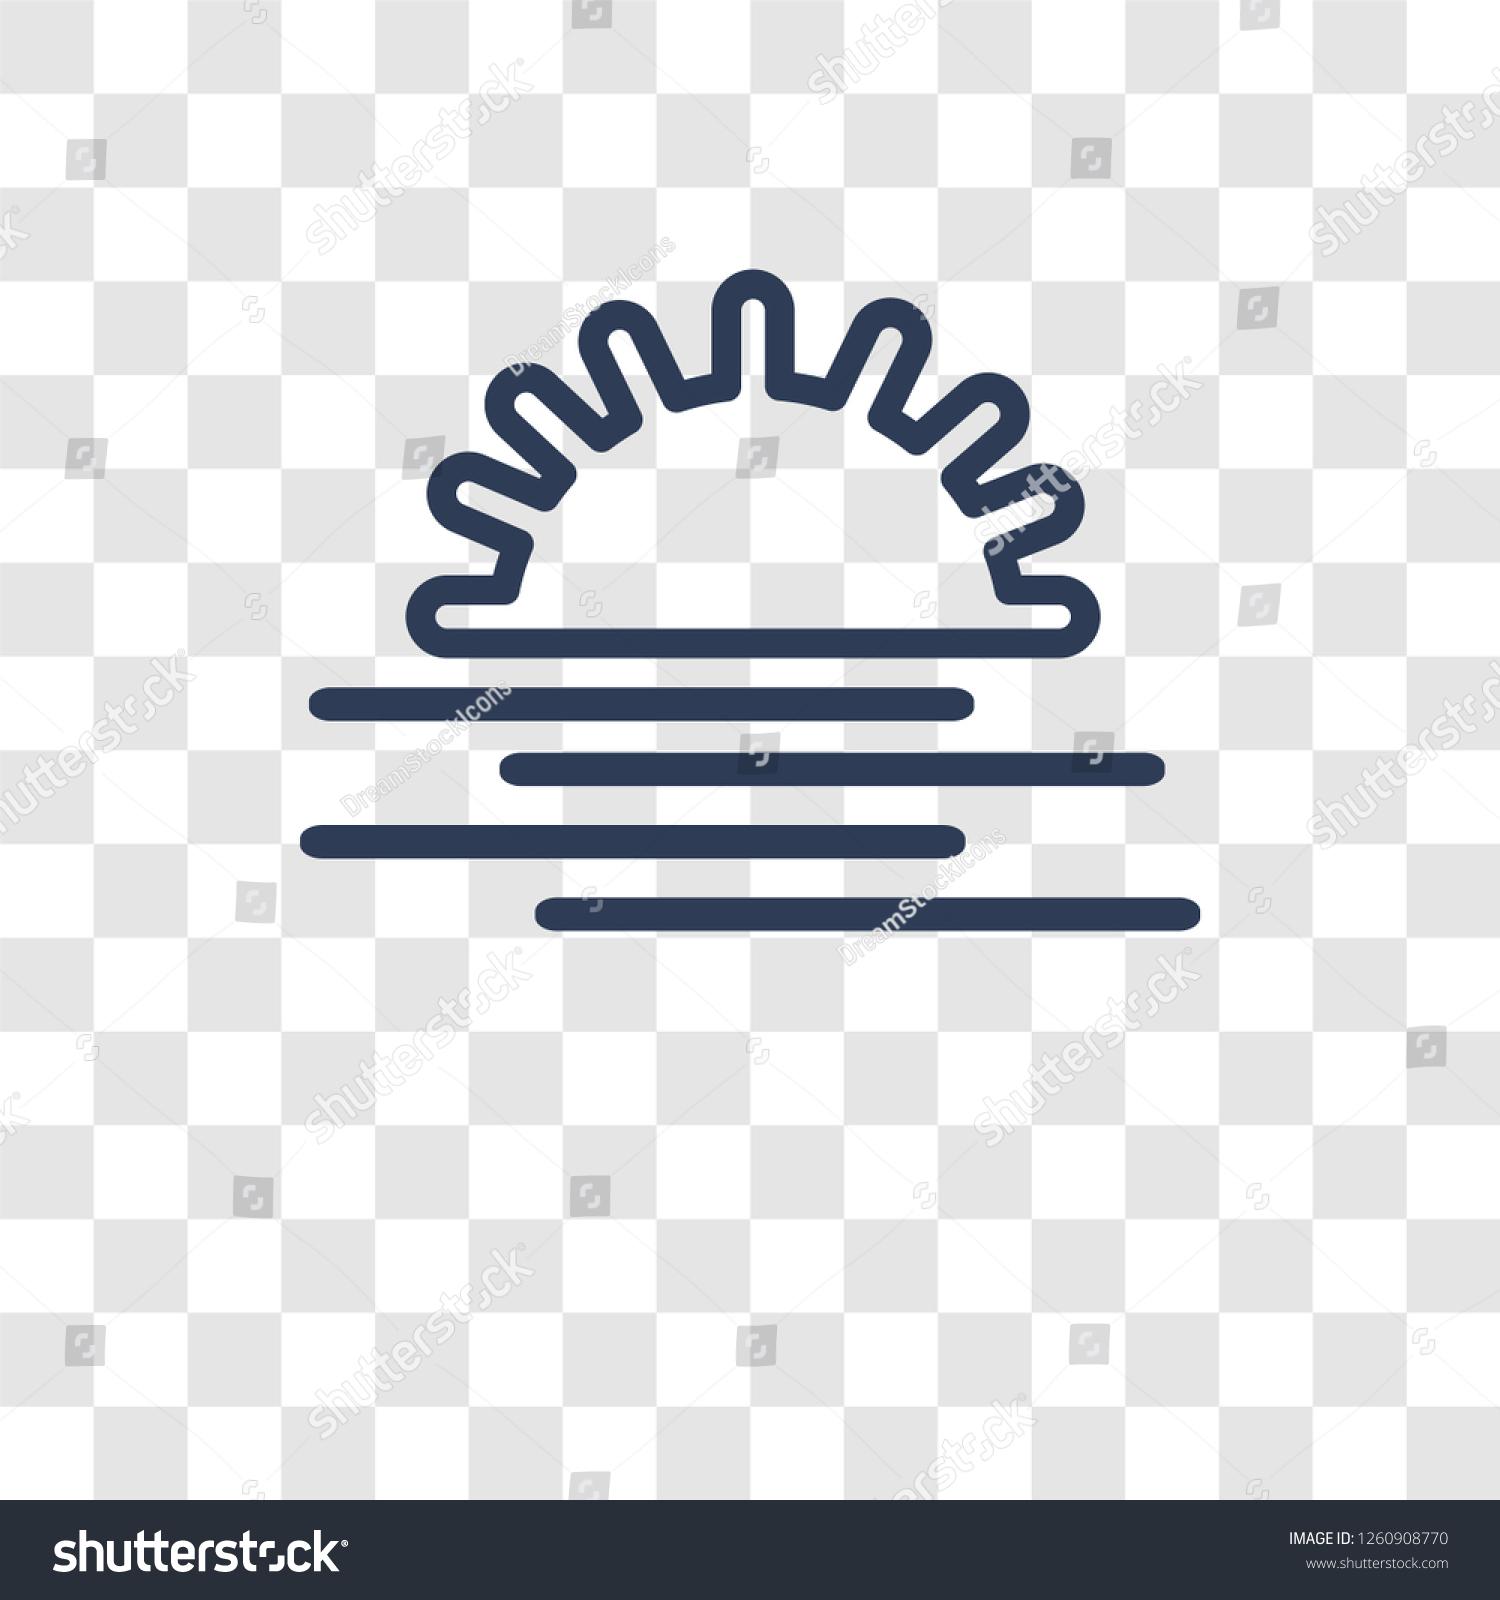 sunset sea icon trendy sunset sea stock vector royalty free 1260908770 shutterstock